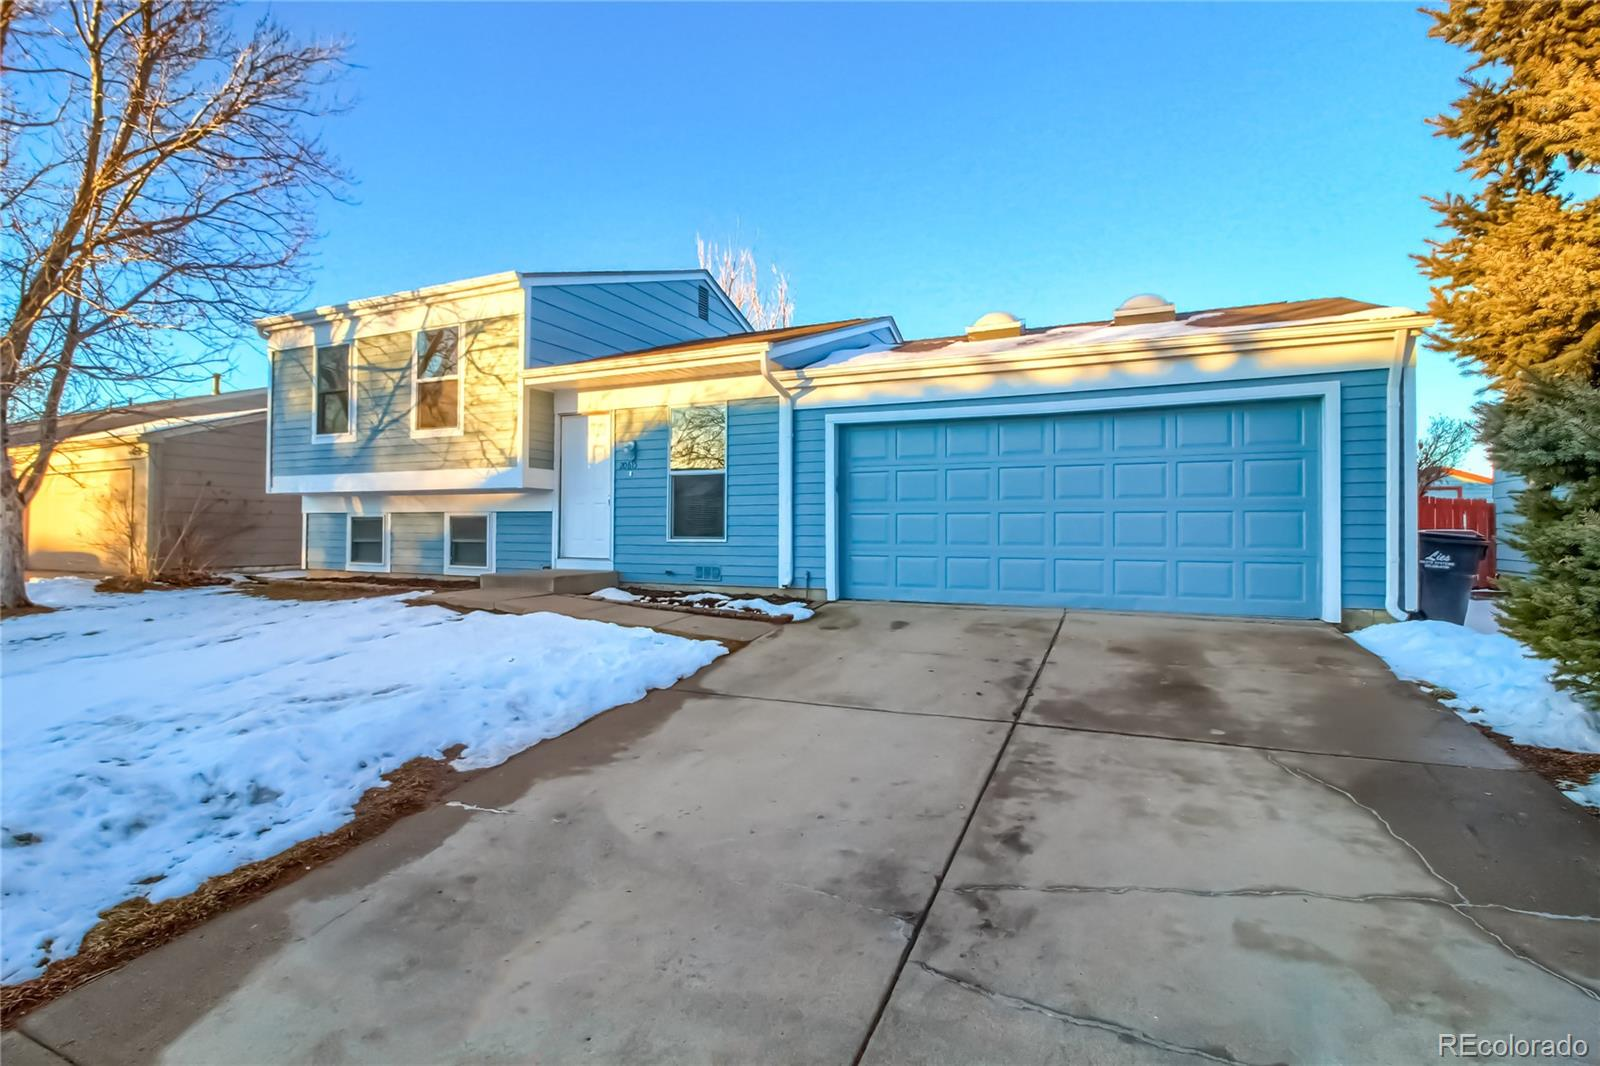 MLS# 8804701 - 1 - 20615 E Coolidge Place, Aurora, CO 80011